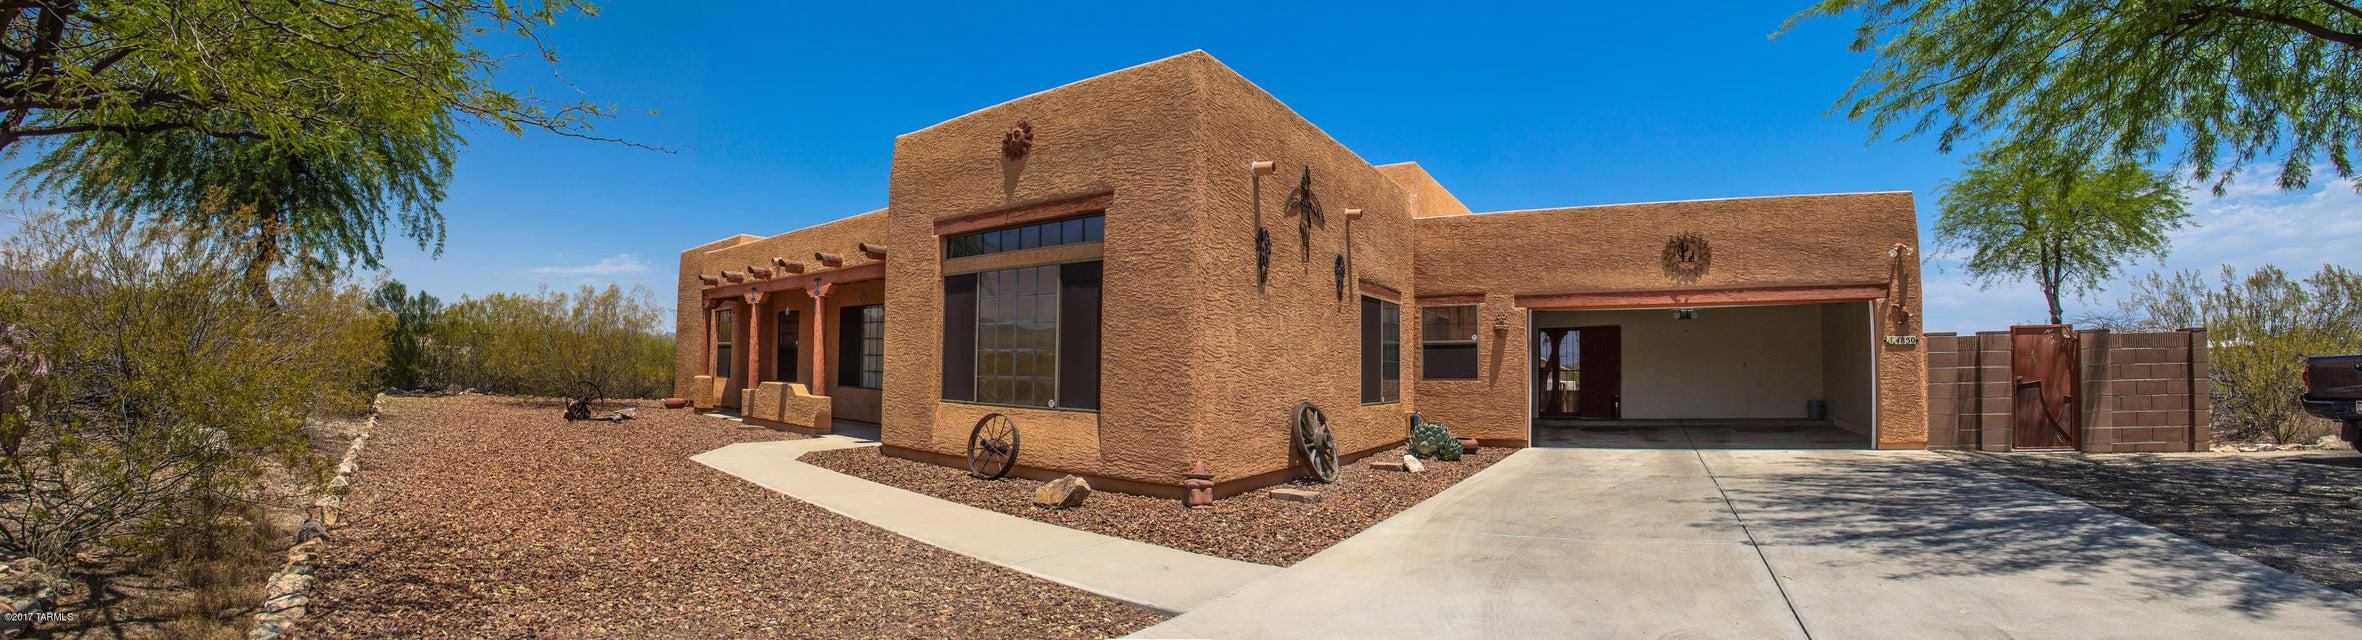 4850 W El Camino Del Cerro, Tucson, AZ 85745